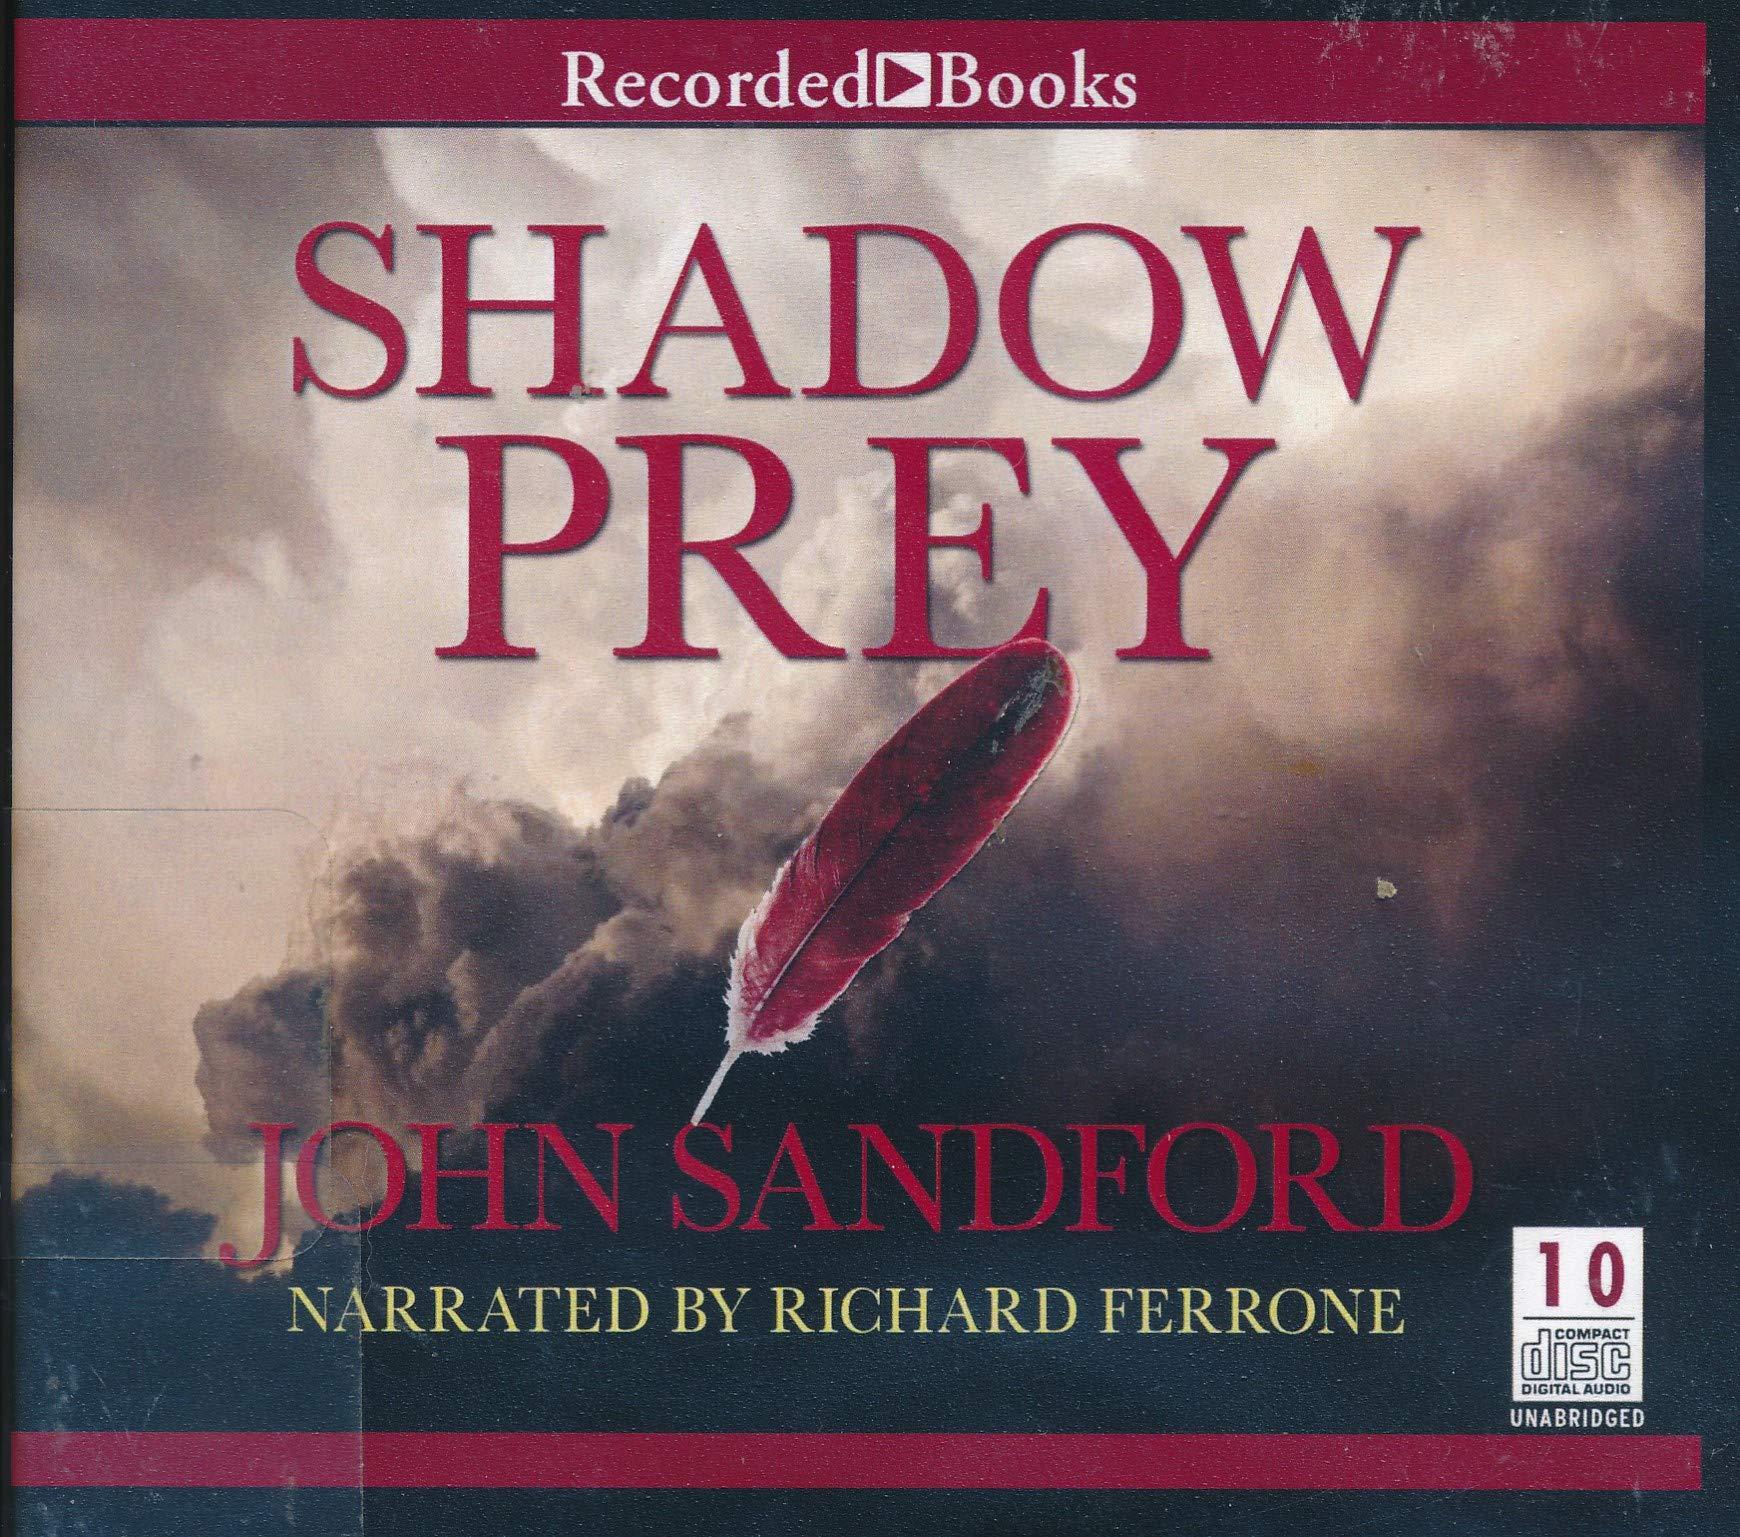 Shadow Prey by John Sandford Unabridged CD Audiobook